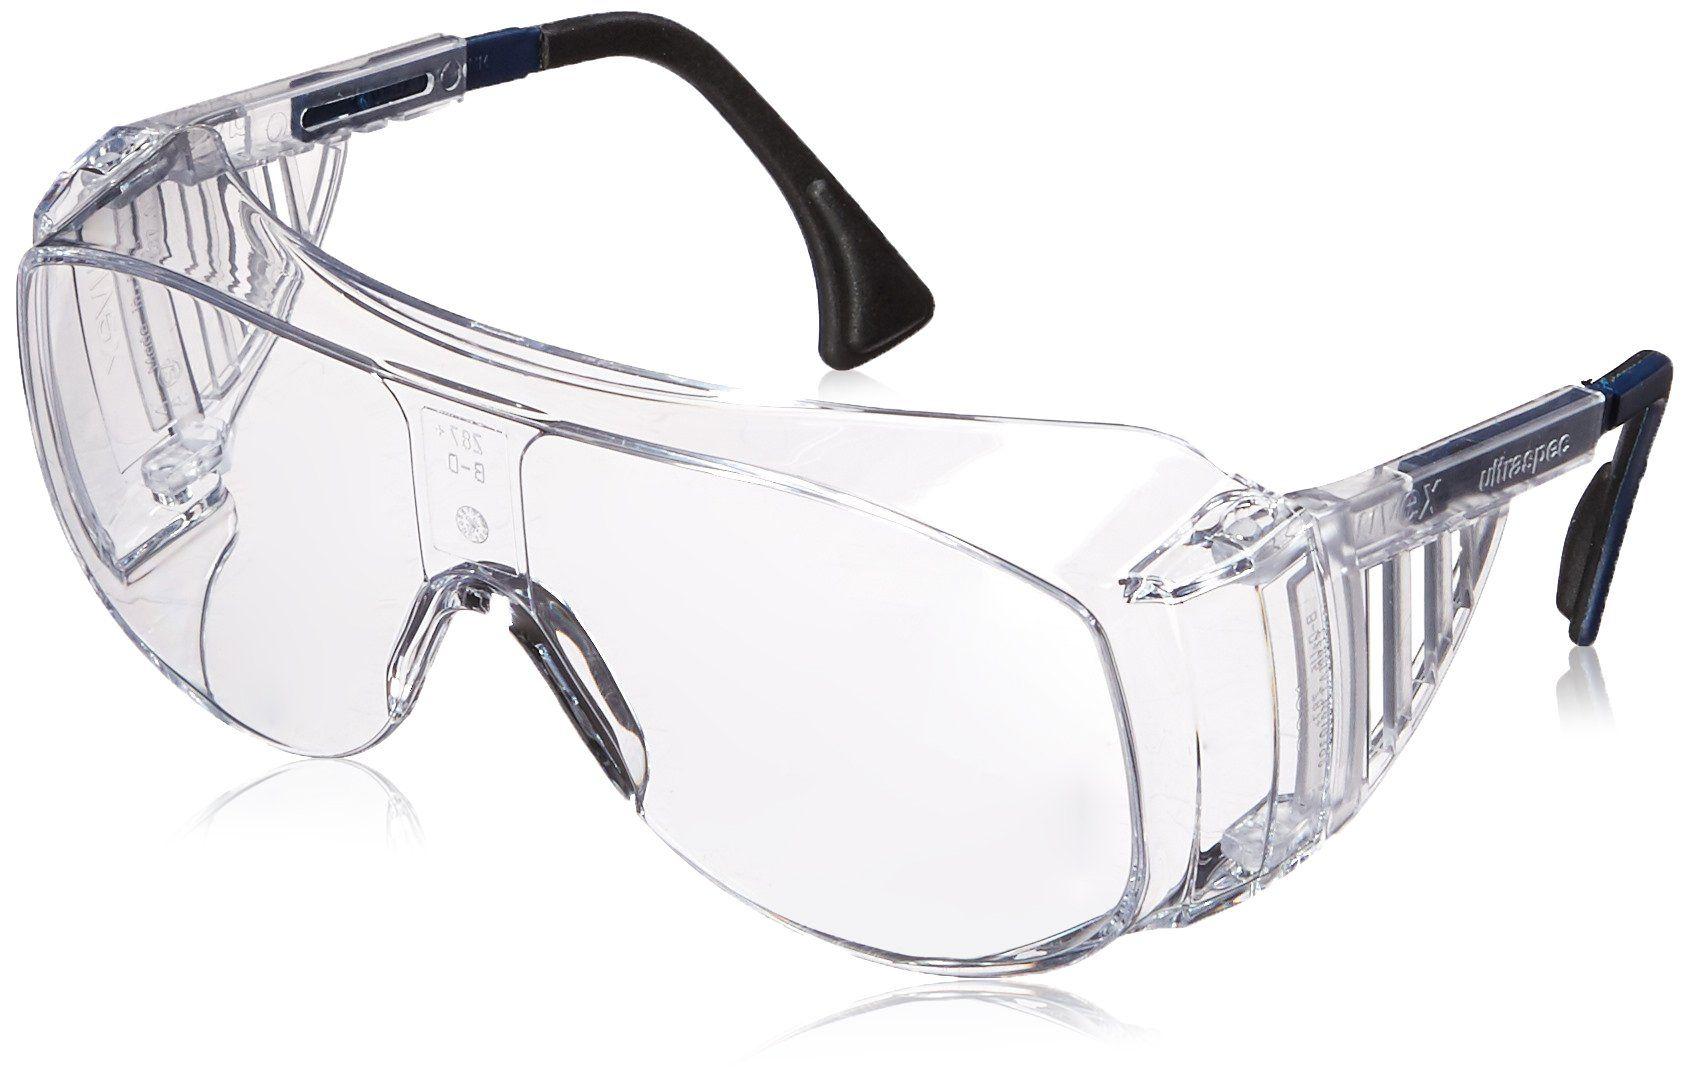 Uvex S0112C Ultraspec 2001 OTG Safety Eyewear, Clear